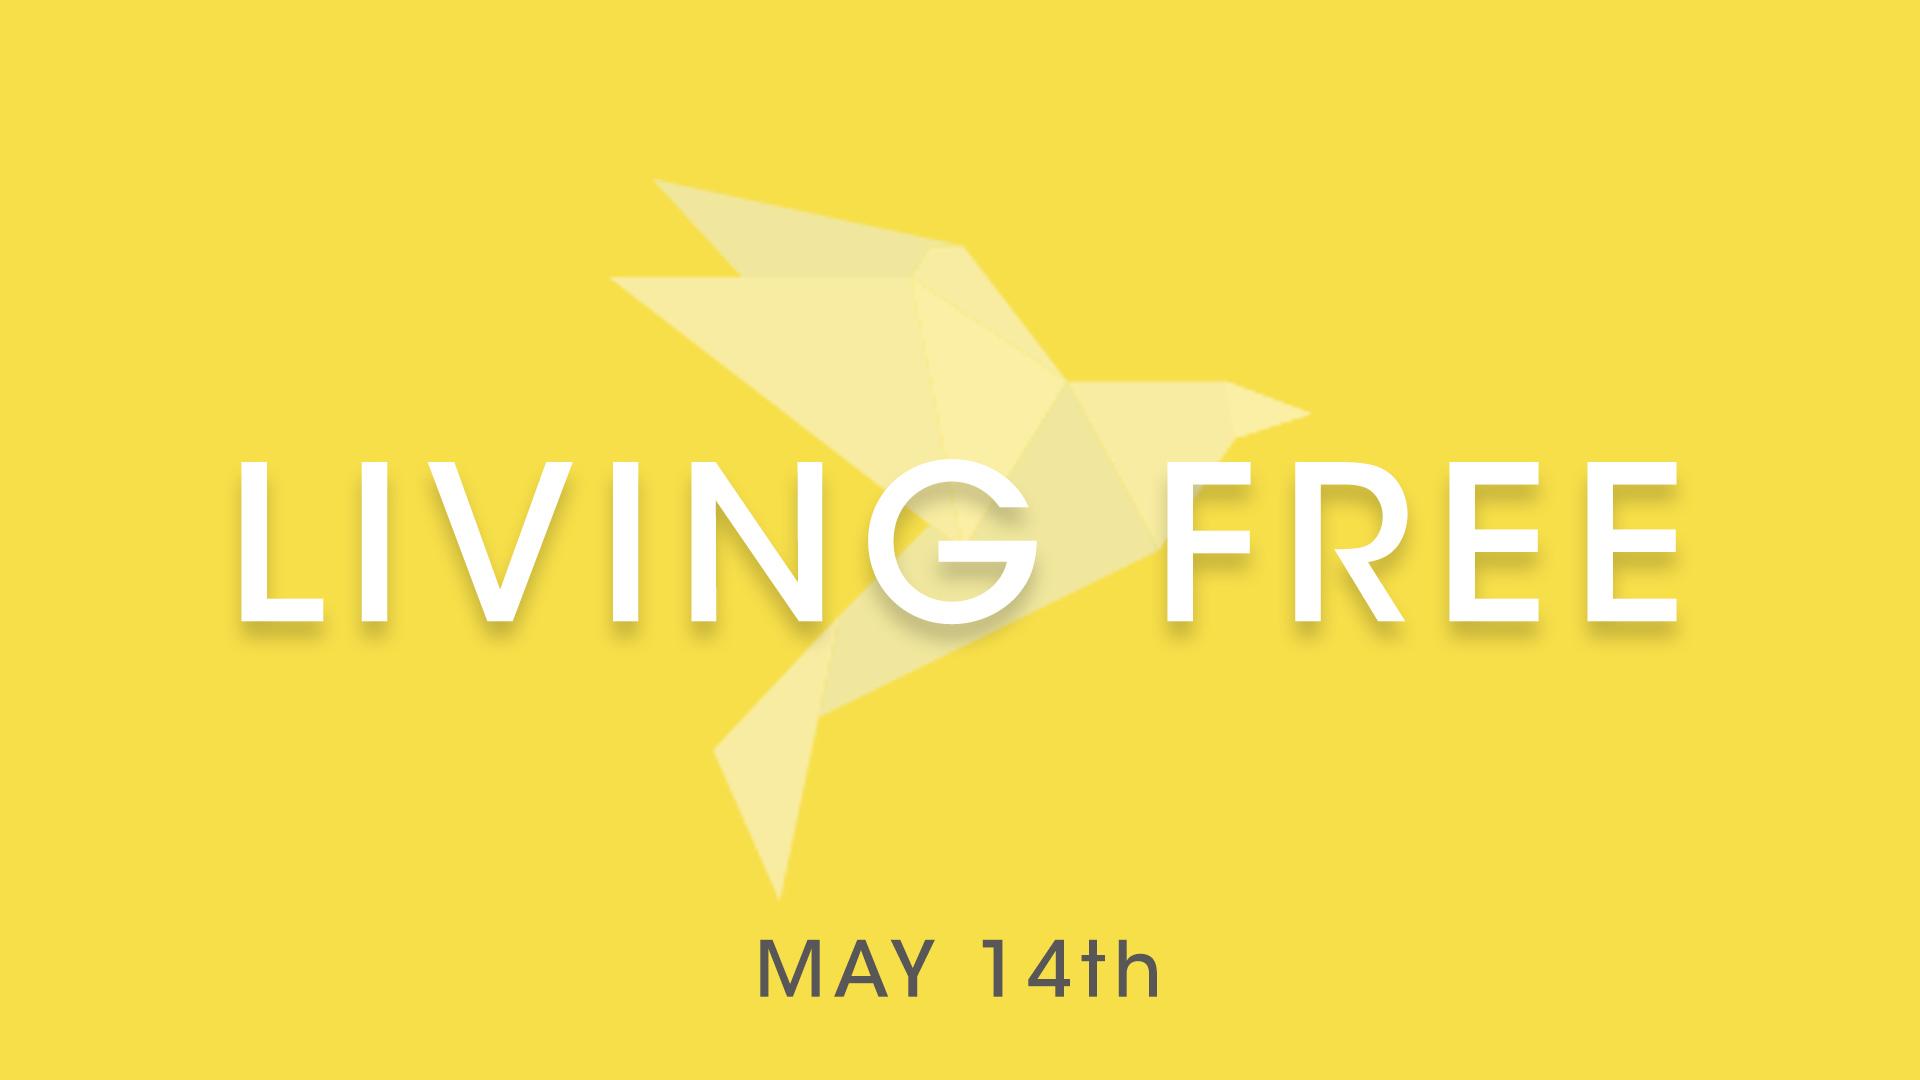 Living-Free.jpg